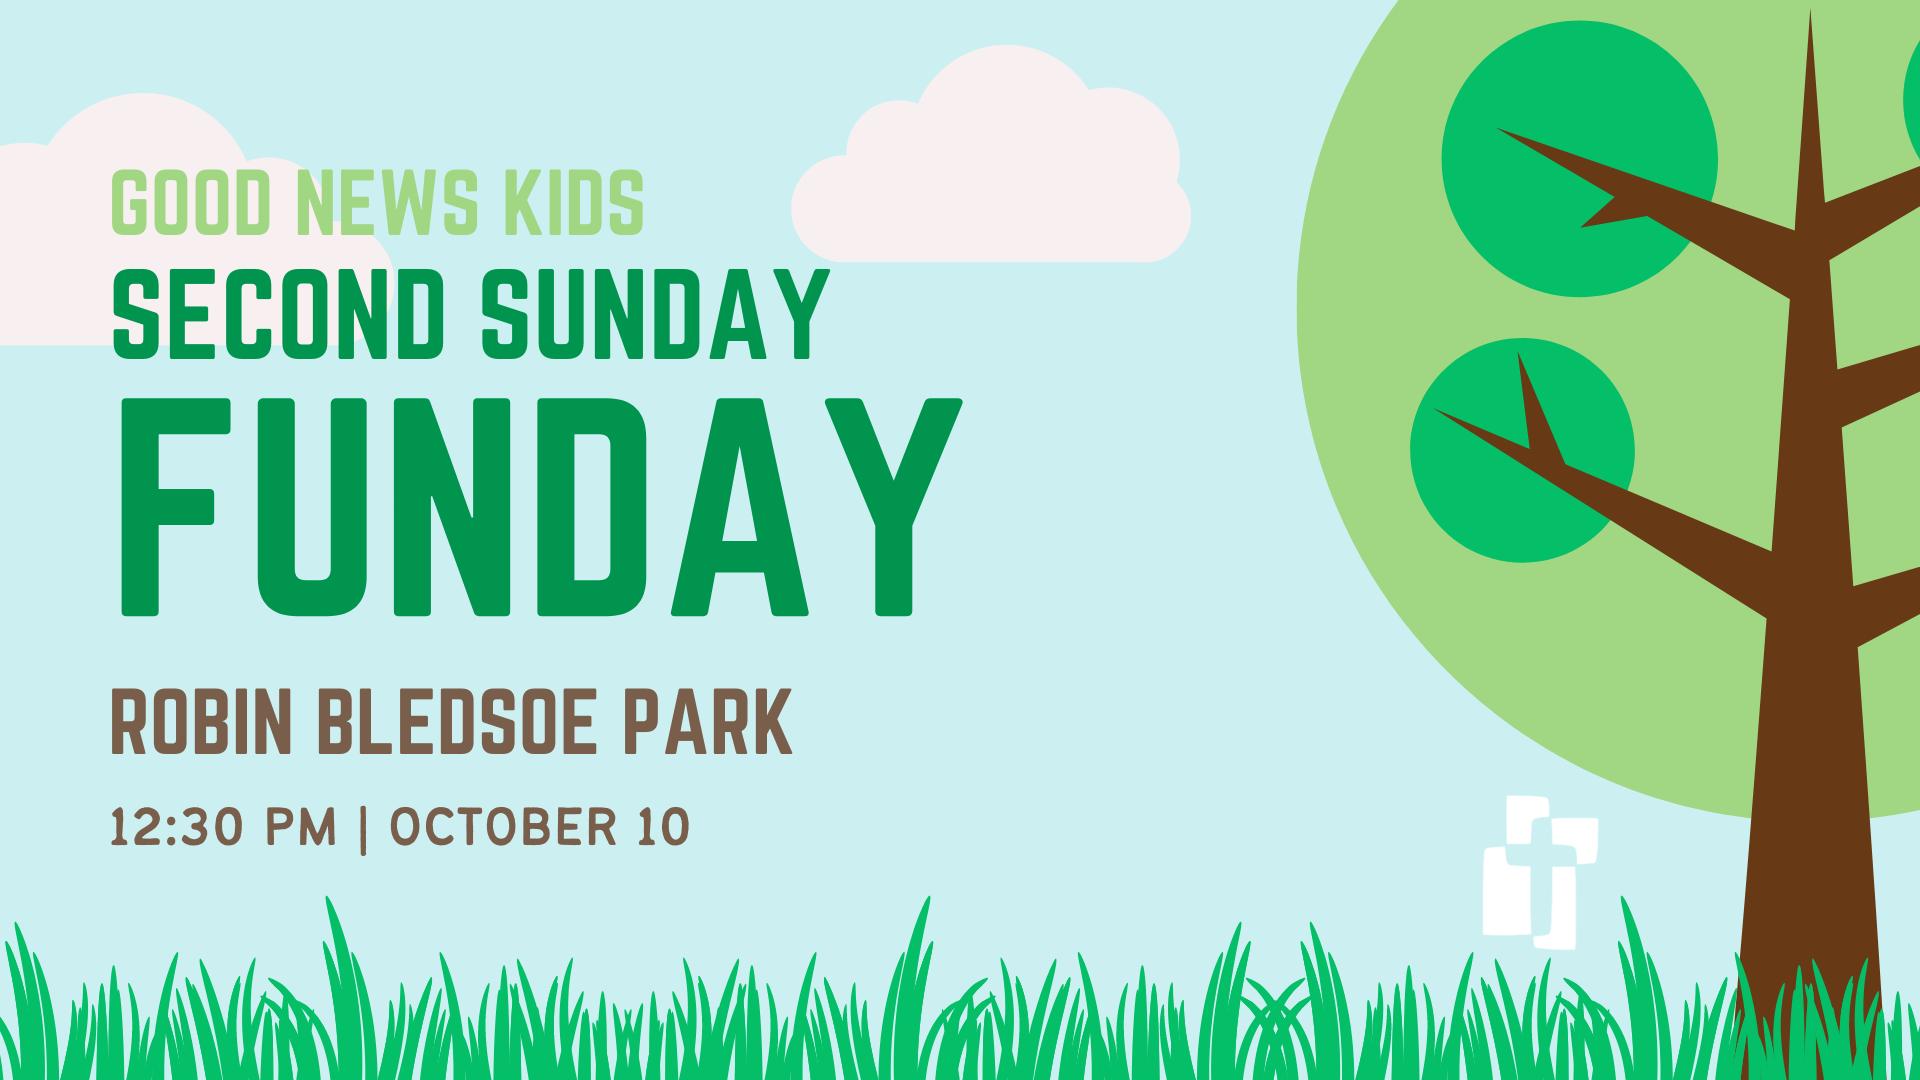 Good News Kids Second Sunday Funday